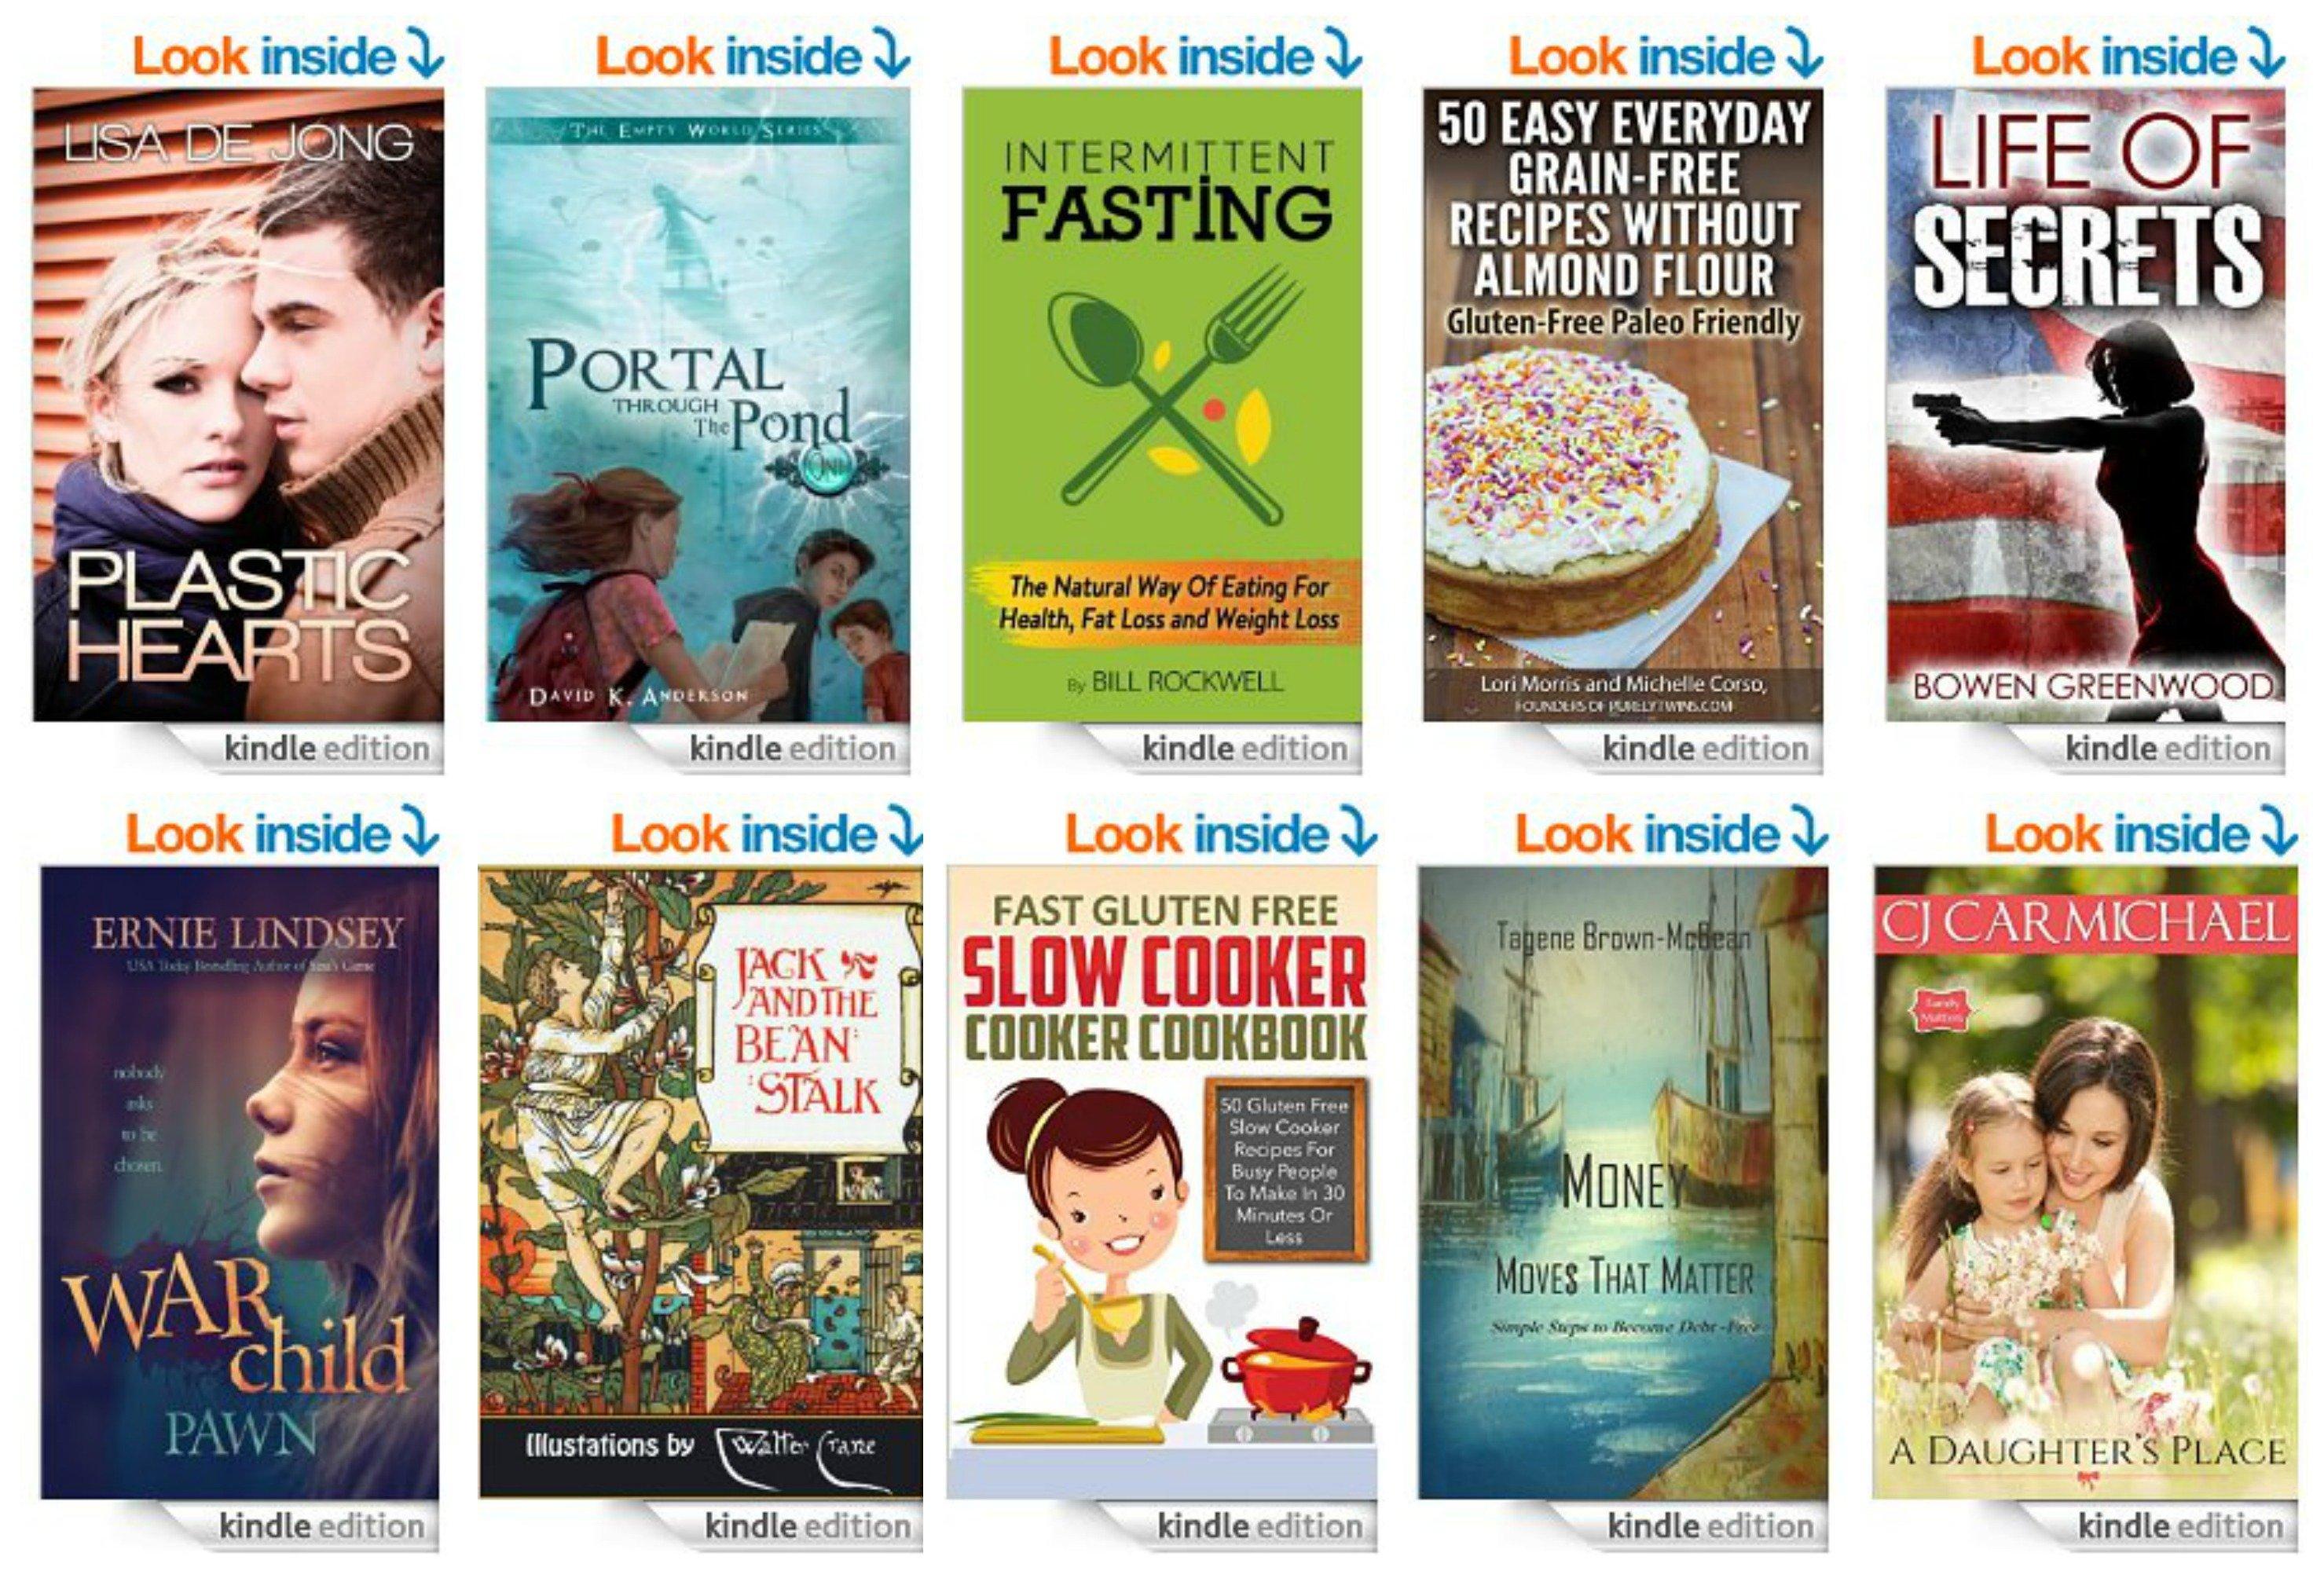 10 Free Kindle Ebooks: 50 Grain Free Re cipes, War Child, Gluten Free Slow Cooker Cookbook